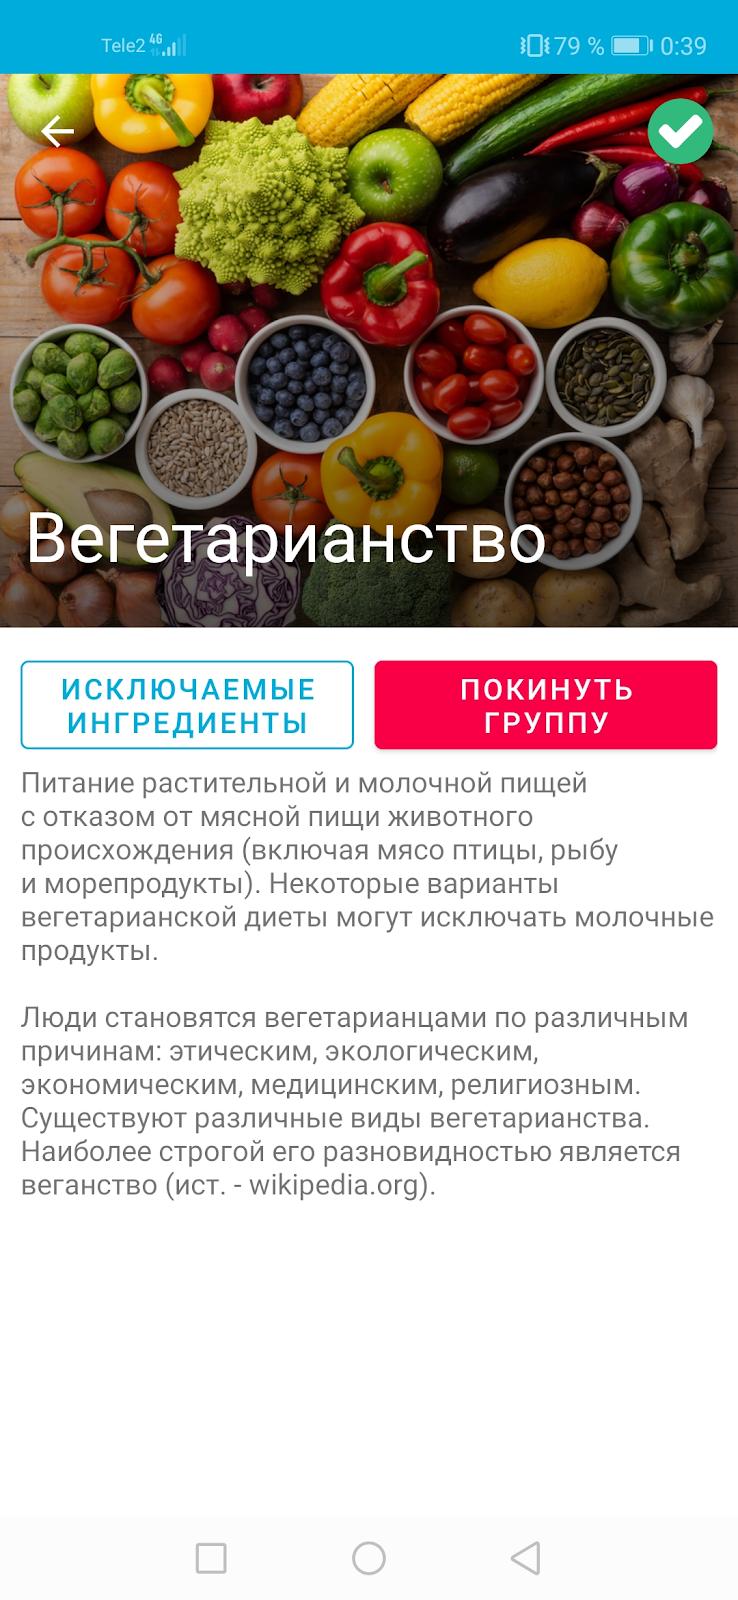 Техновыпуск Mail.ru Group, зима 2019 - 17